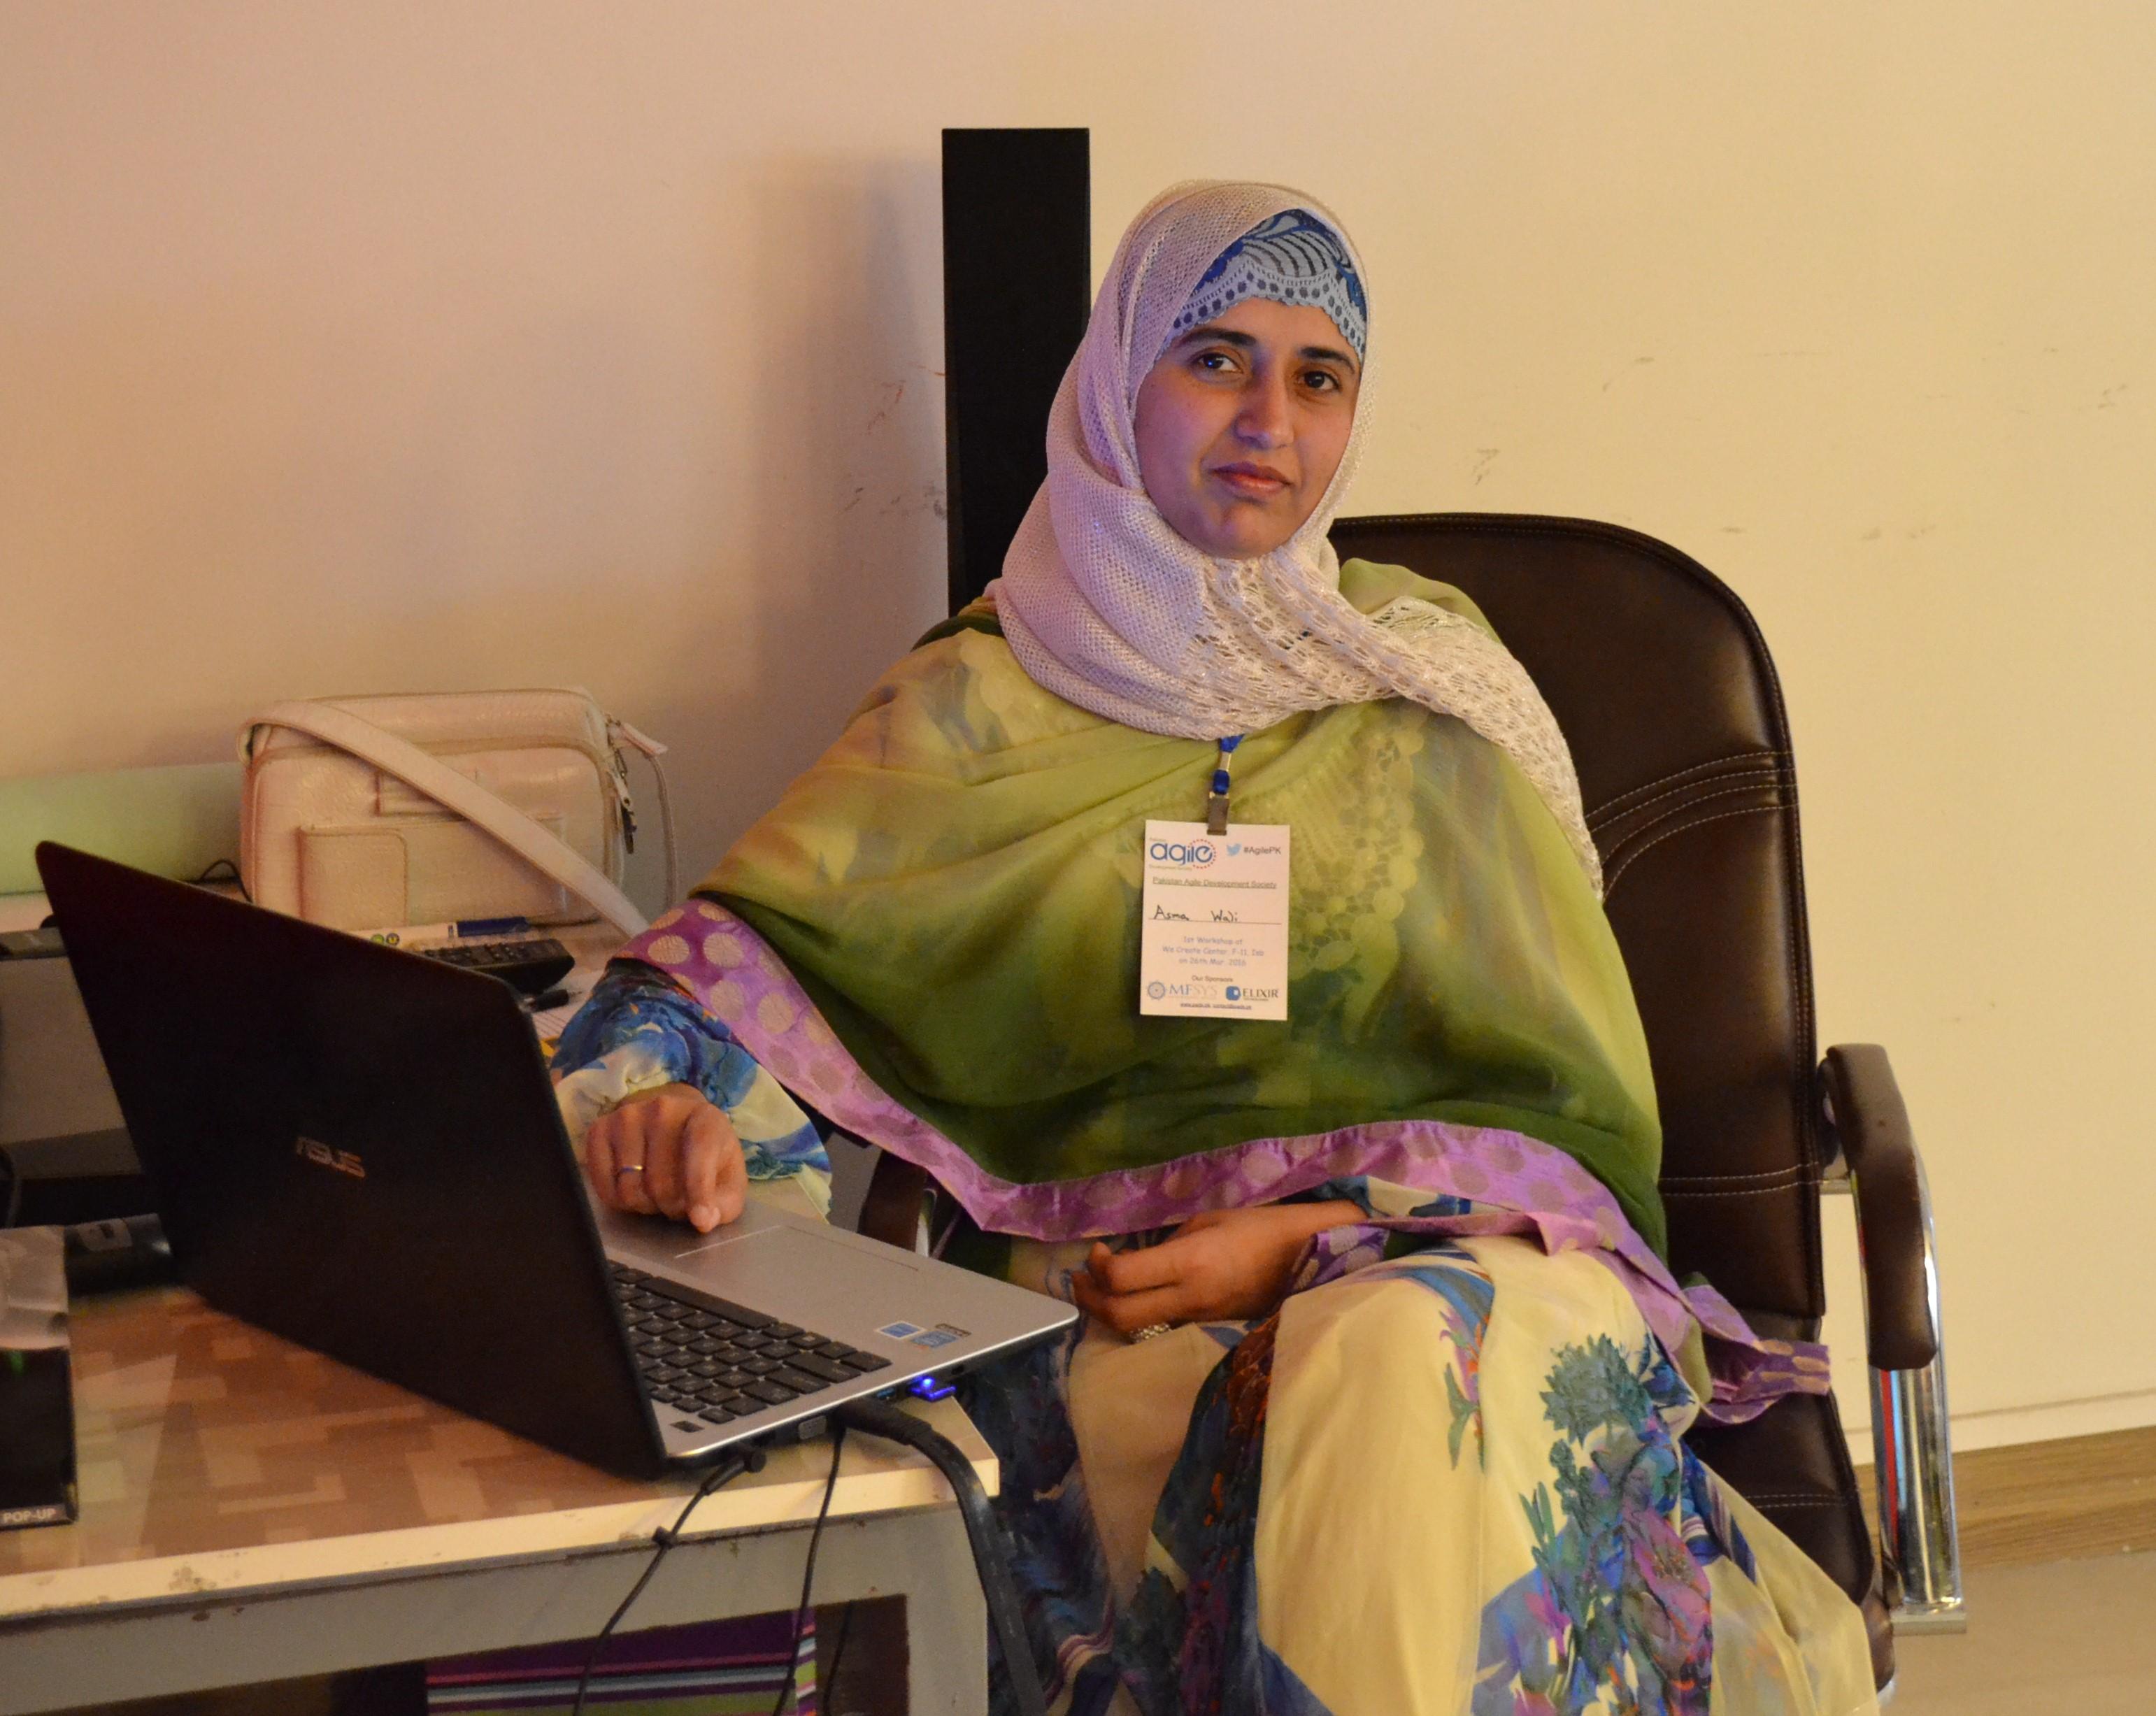 Asma Wali